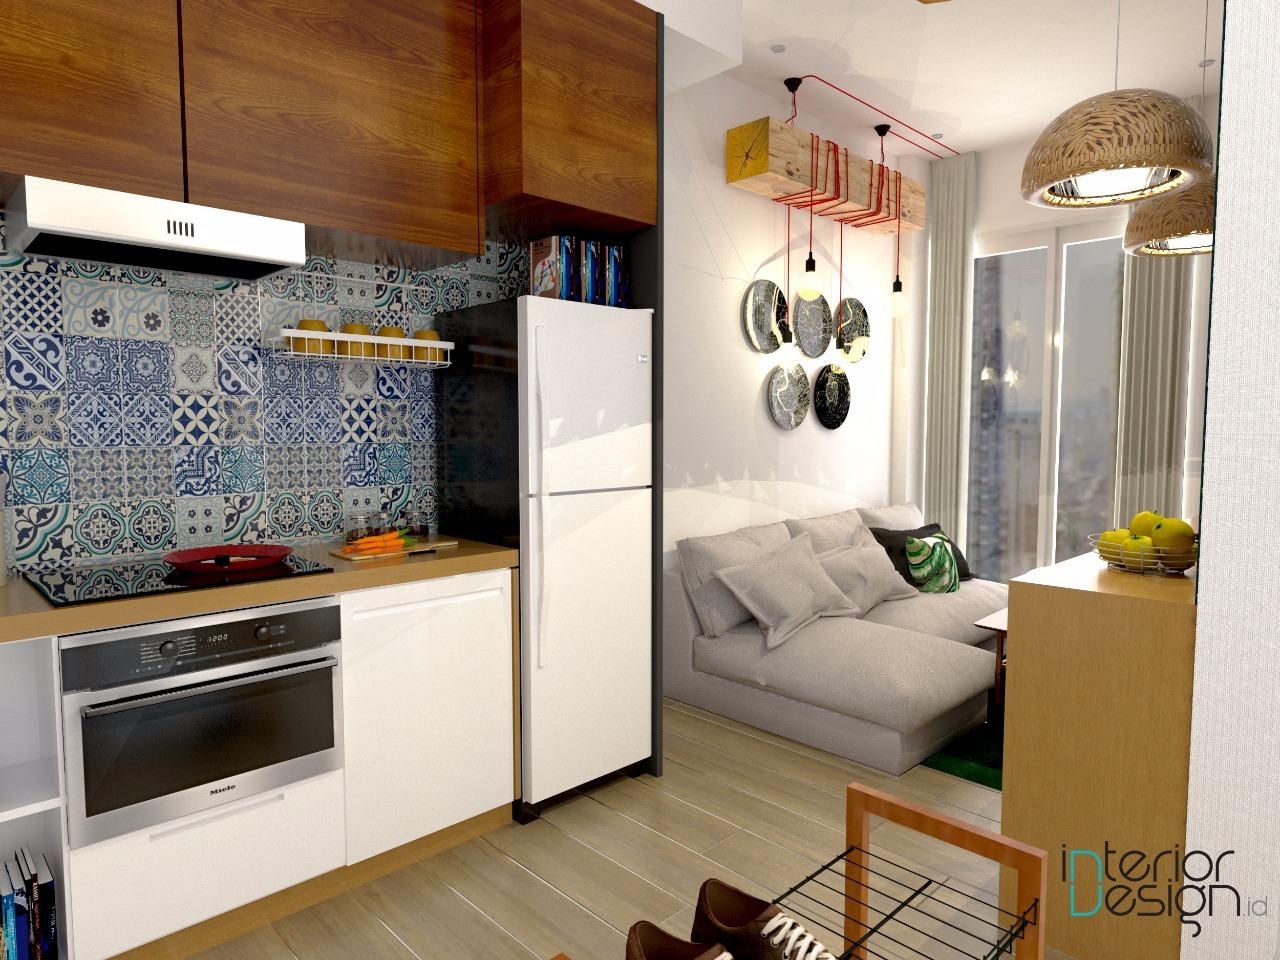 Pantry apartemen jakarta for Interior design lasalle jakarta